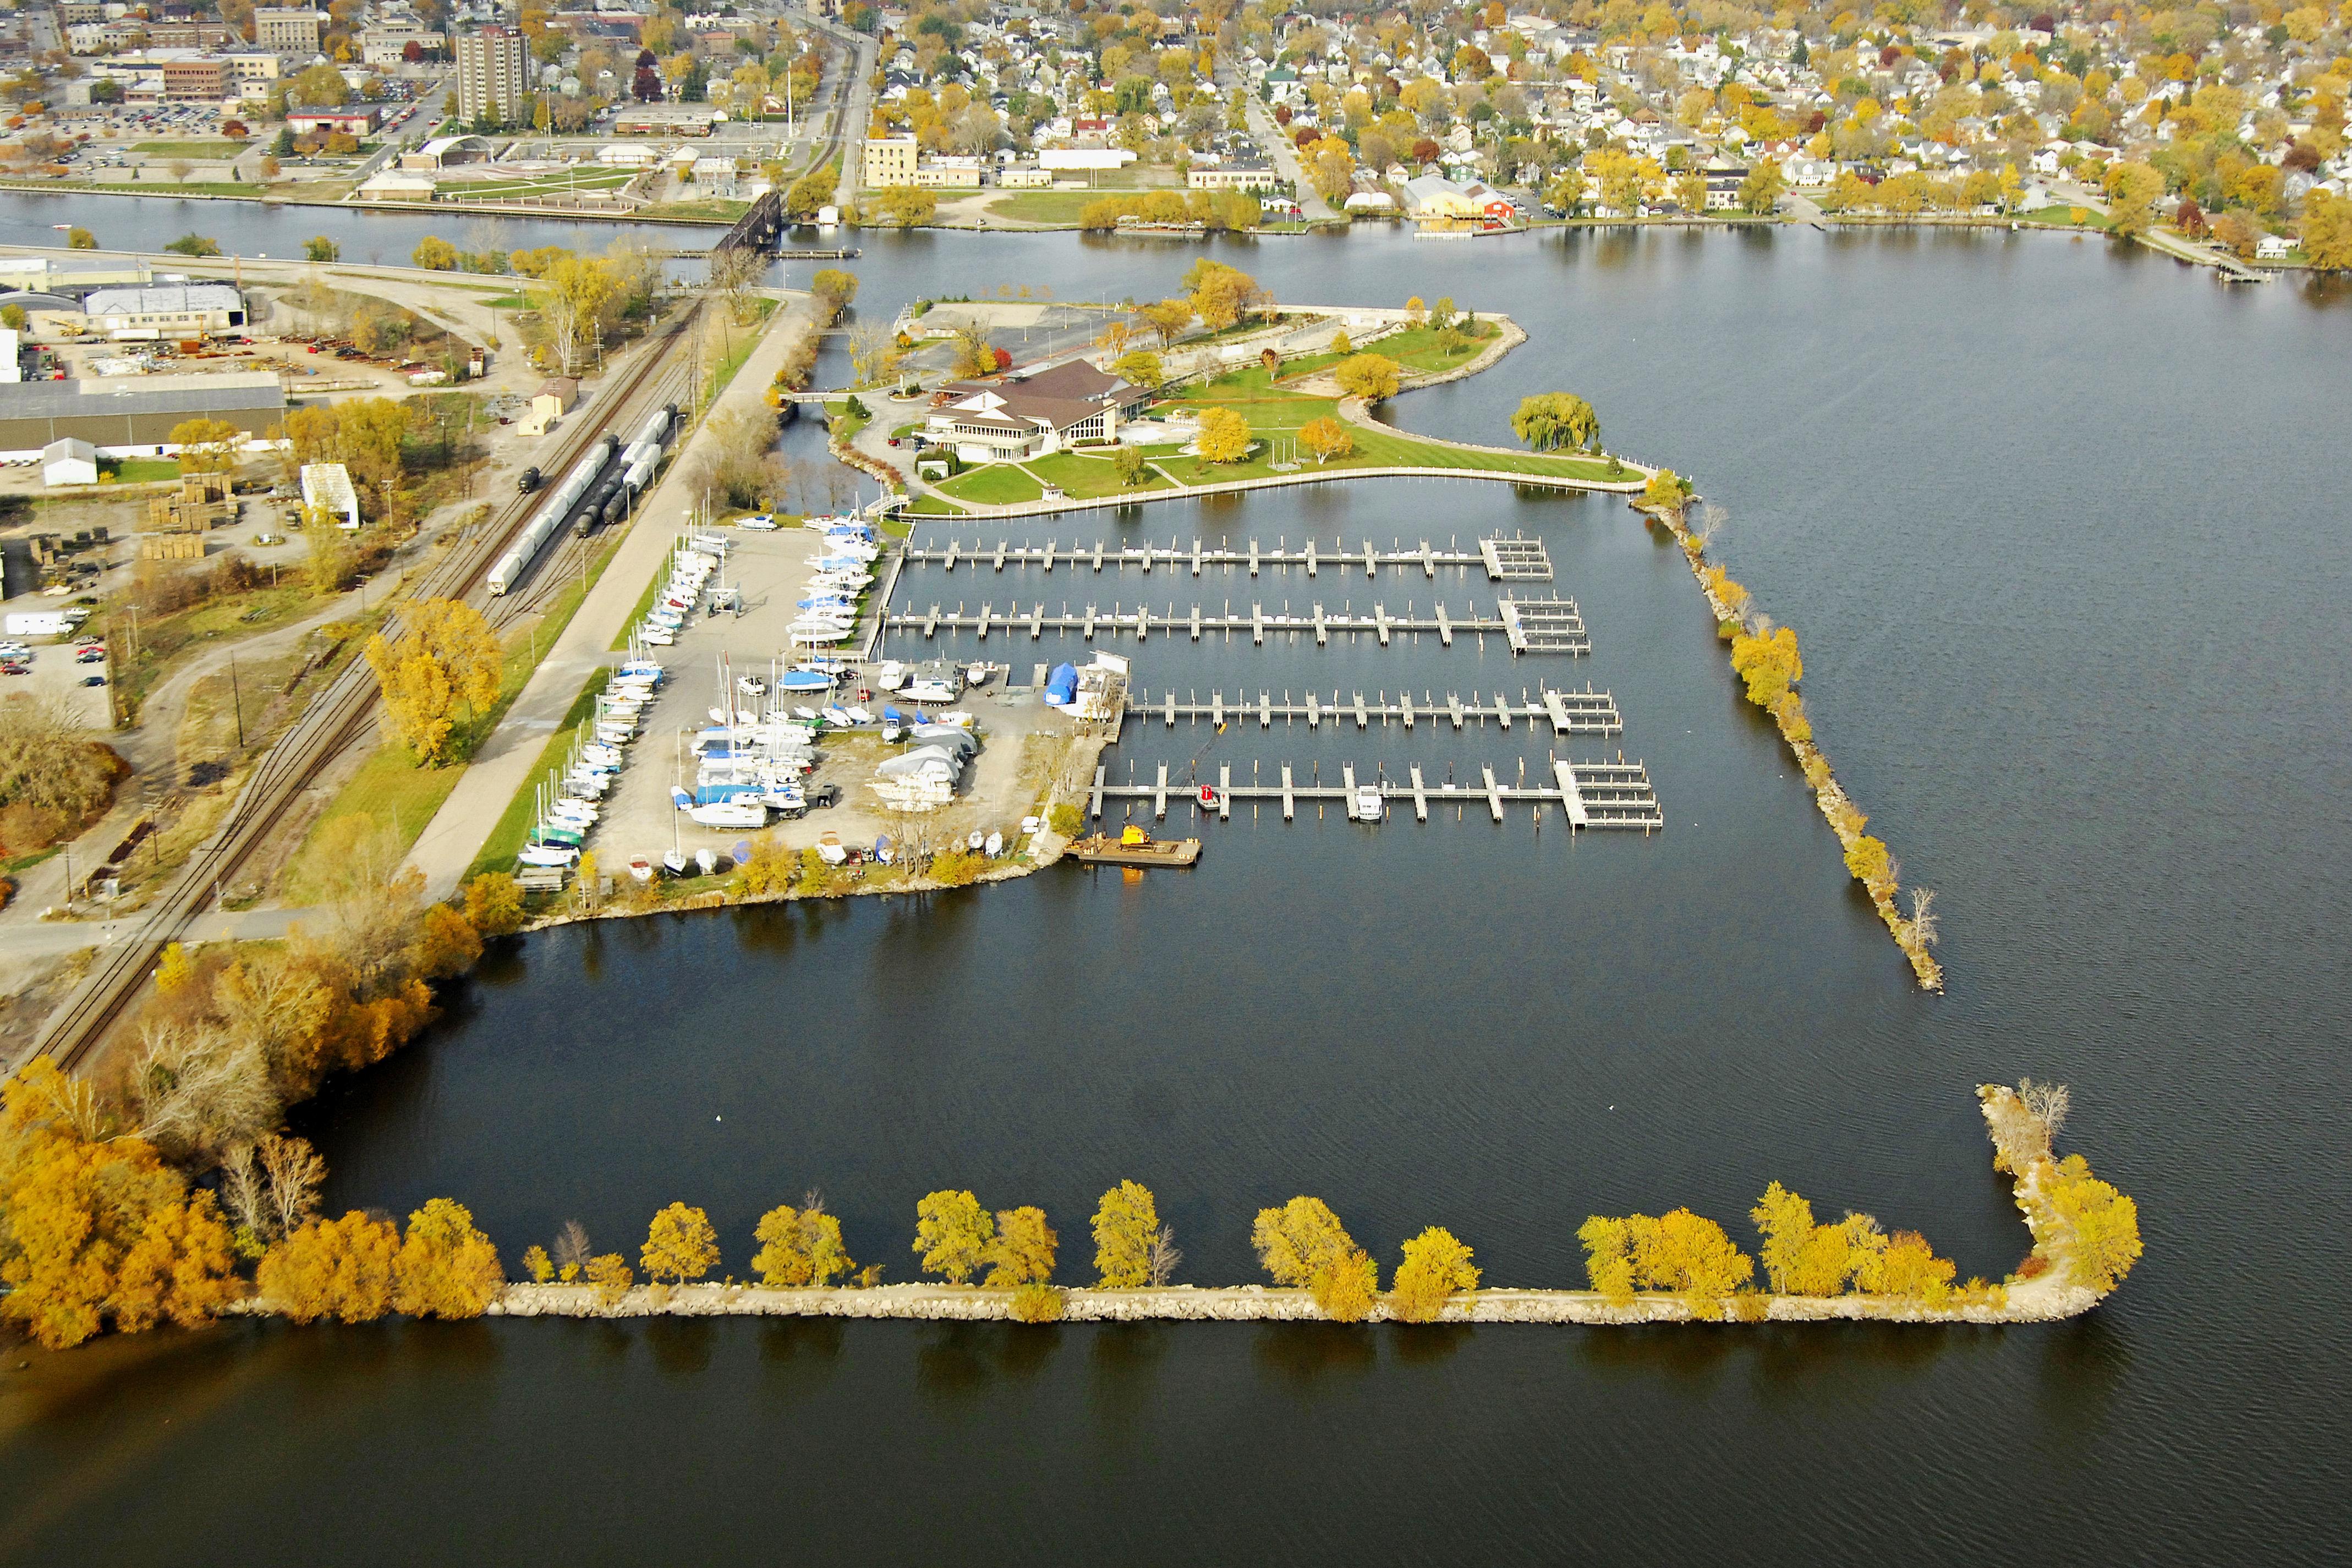 Oshkosh, Wisconsin, The Pioneer Inn Marina (OshkoshWis56